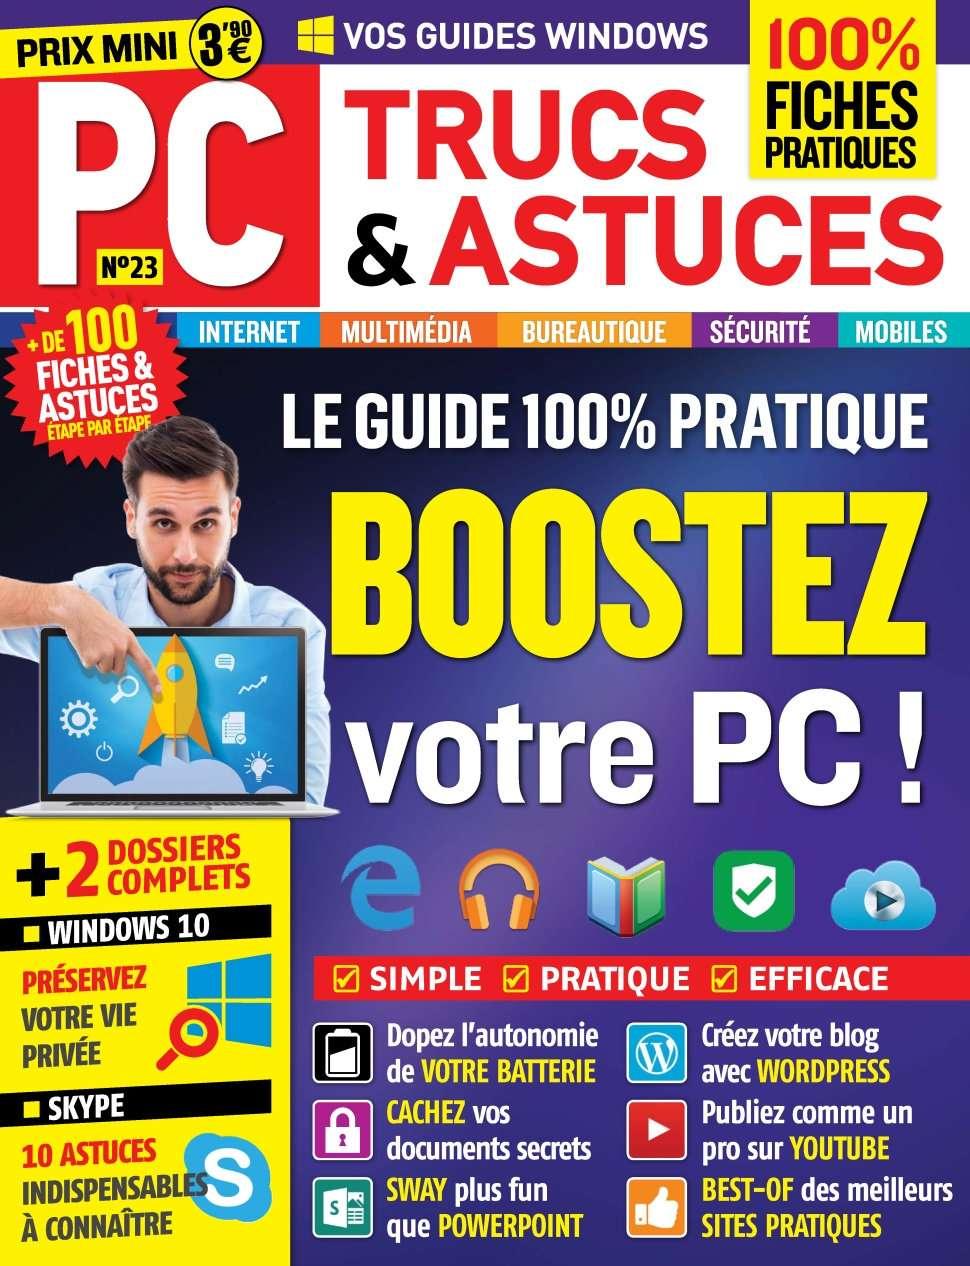 PC Trucs et Astuces 23 - Avril/Mai 2016